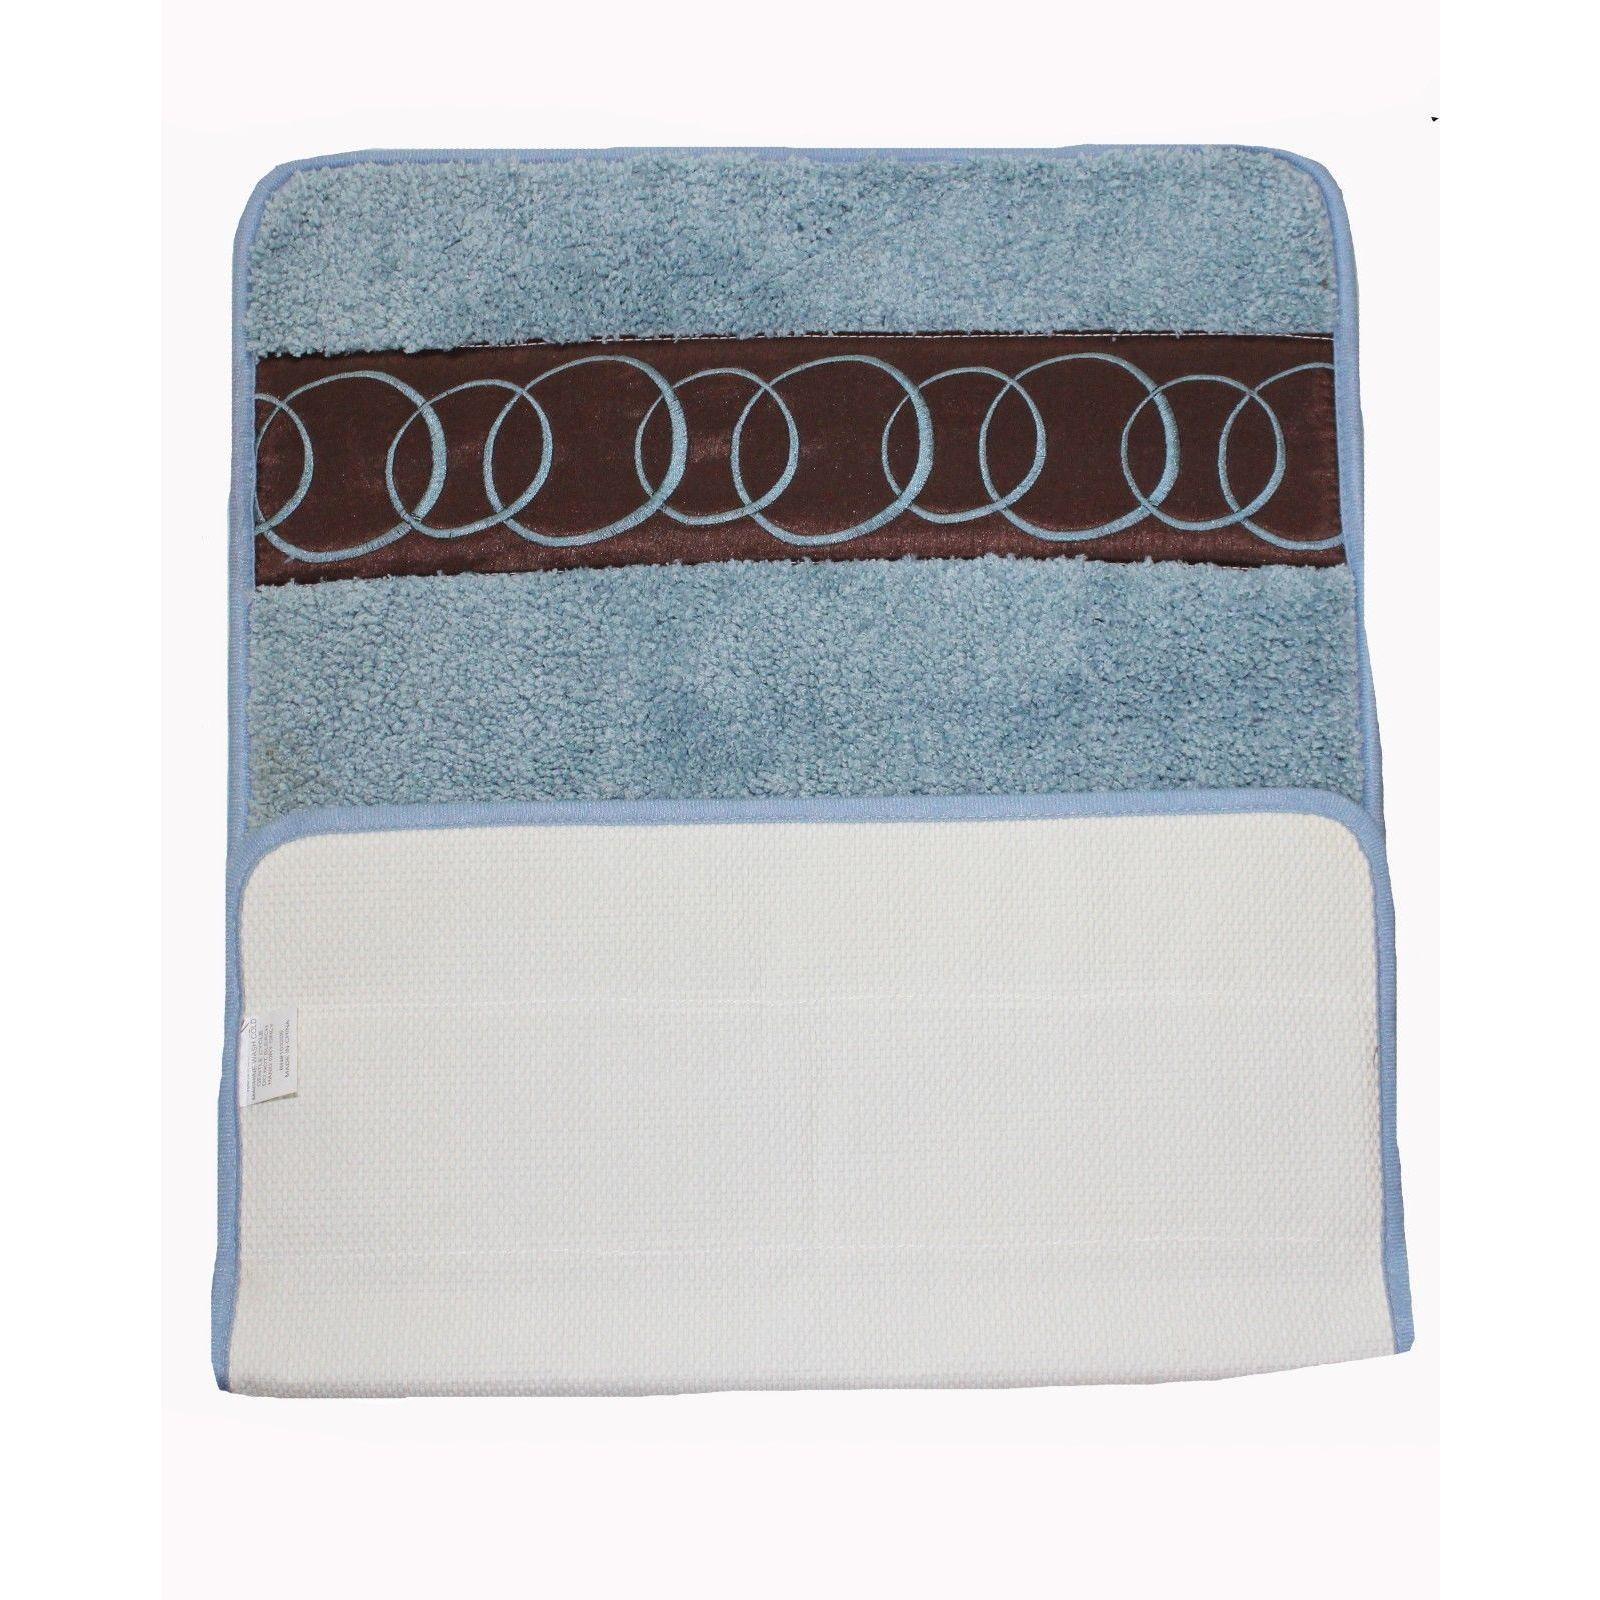 Shop Super Soft Light Blue Latex Backing Non Slip Bath Rug 18 X 30